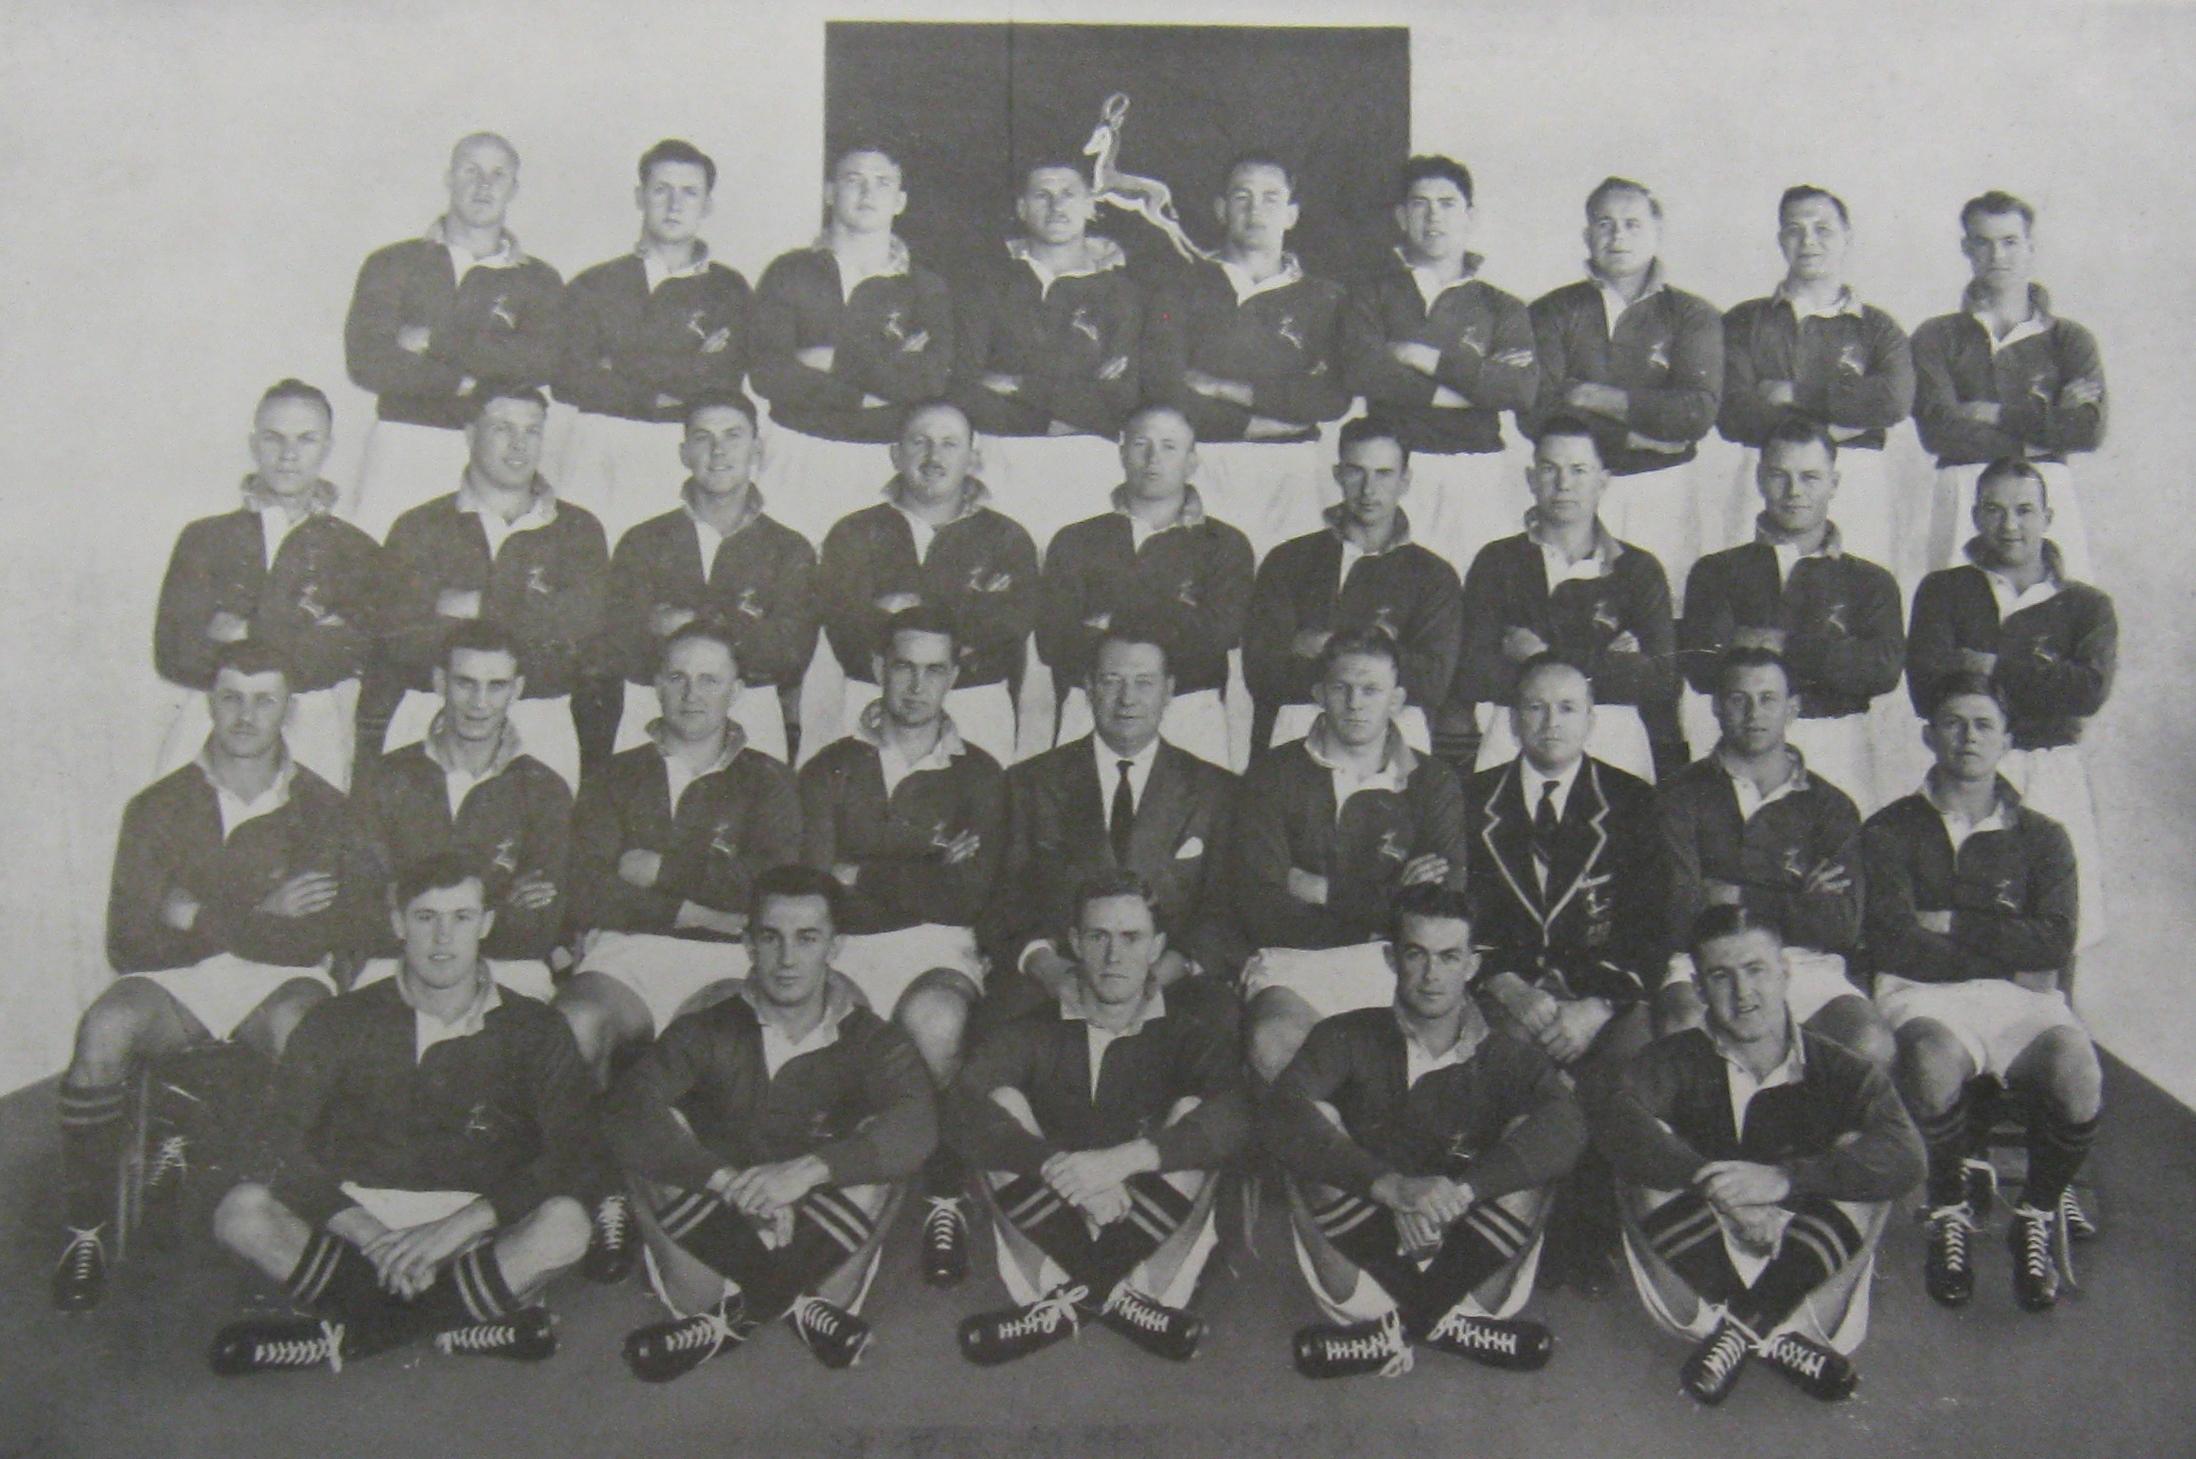 1951 Springboks touring team